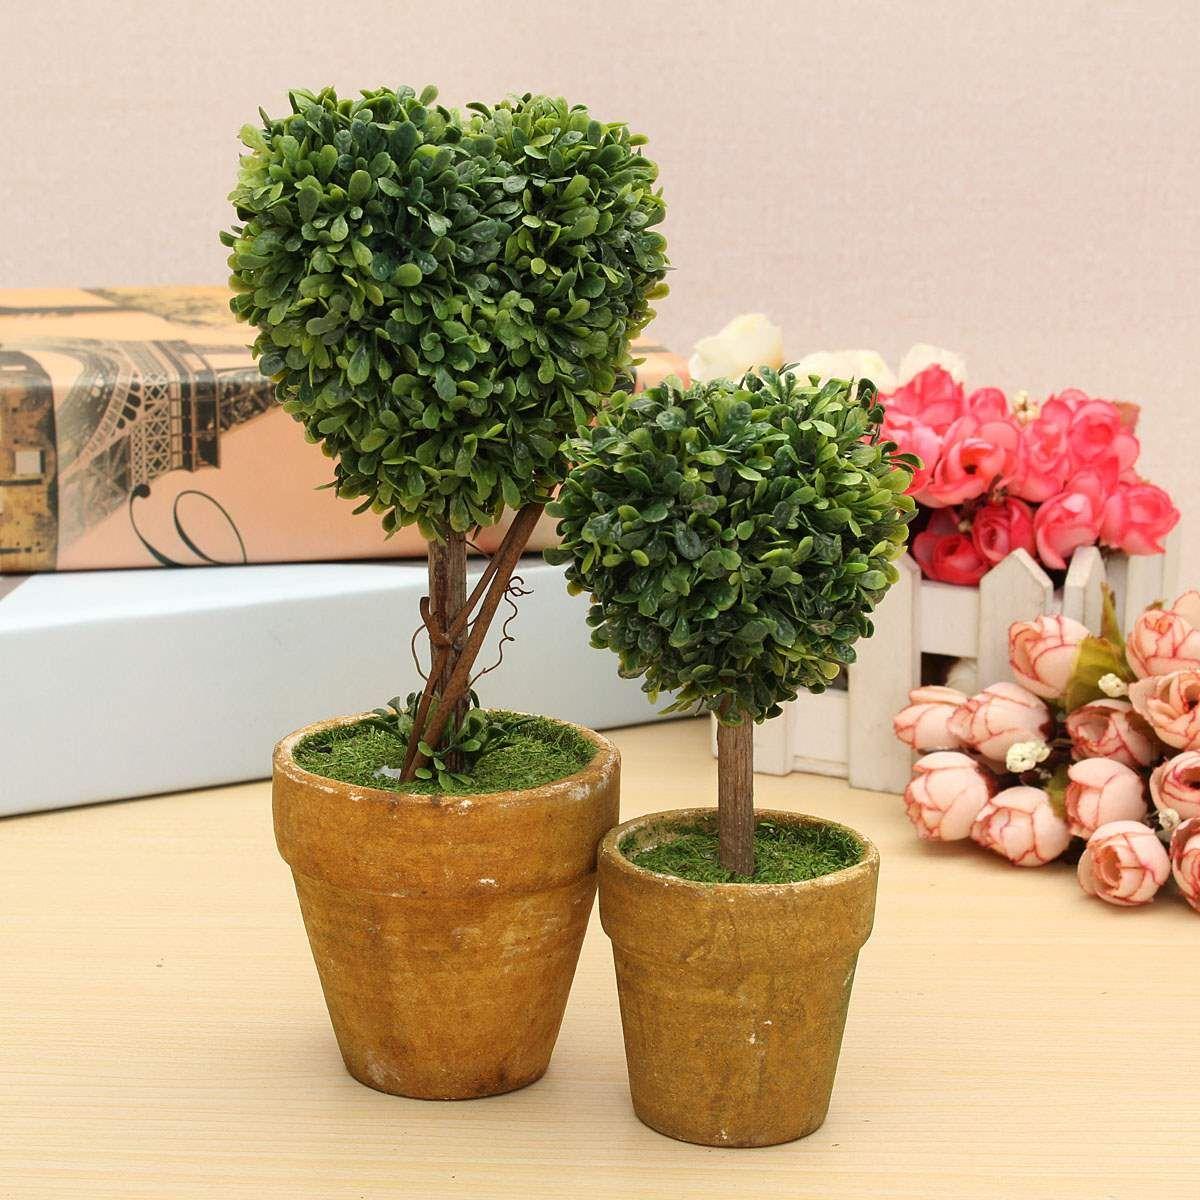 Charmant 2018 Wholesale Wedding Arrangement Artificial Garden Grass Buxus Balls  Boxwood Topiary Landscape Fake Trees Pots Plants From Linita, $21.04 |  Dhgate.Com